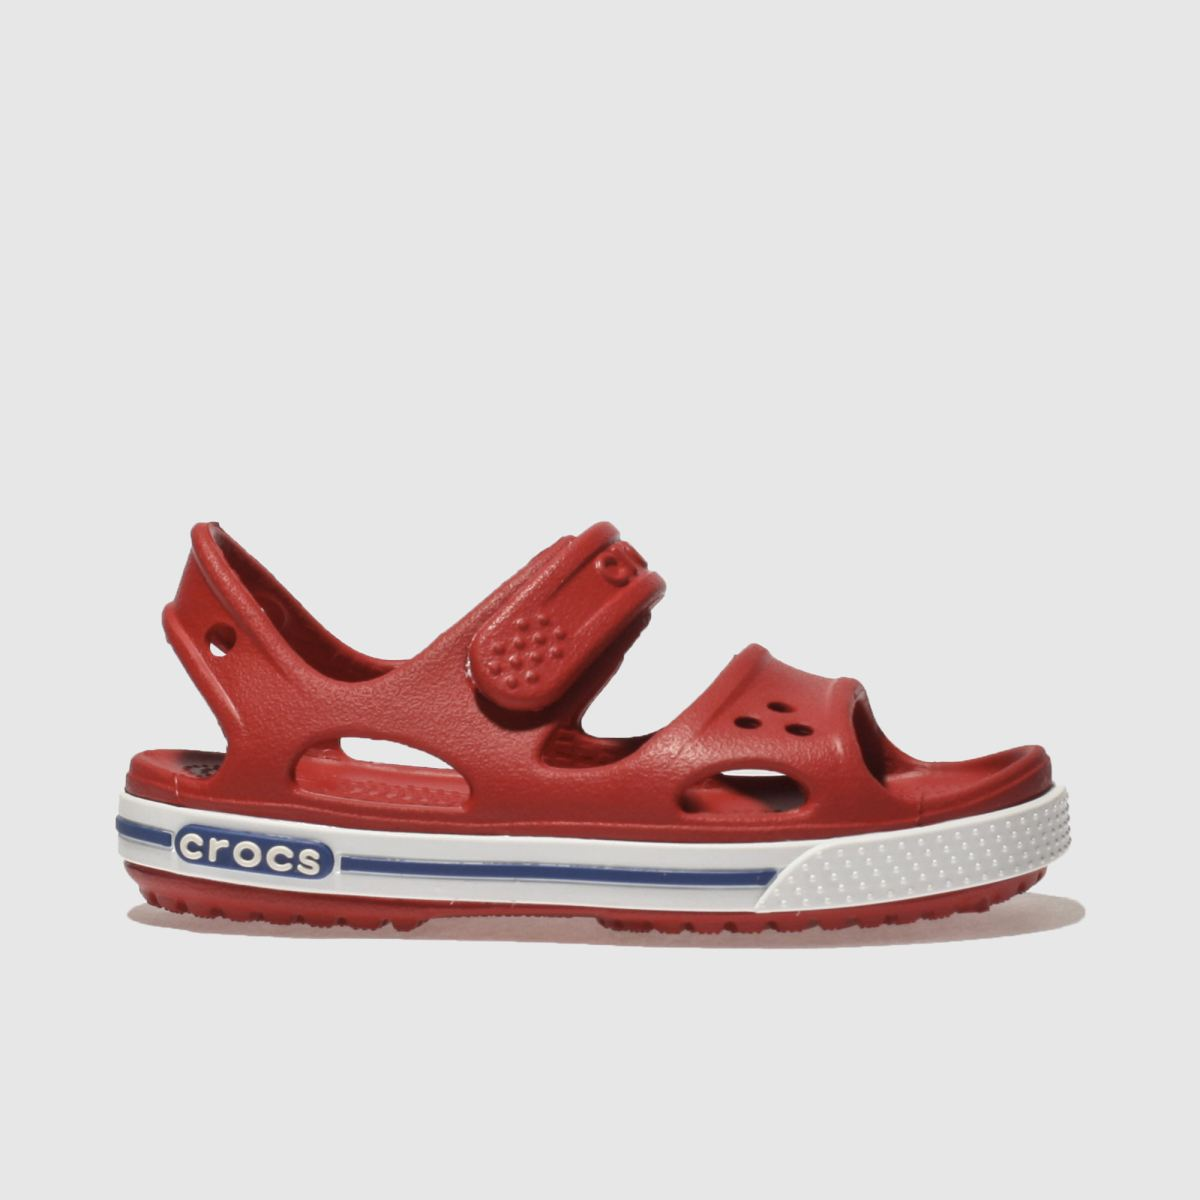 Crocs Crocs Red Crocband Ii Sandal Junior Sandals